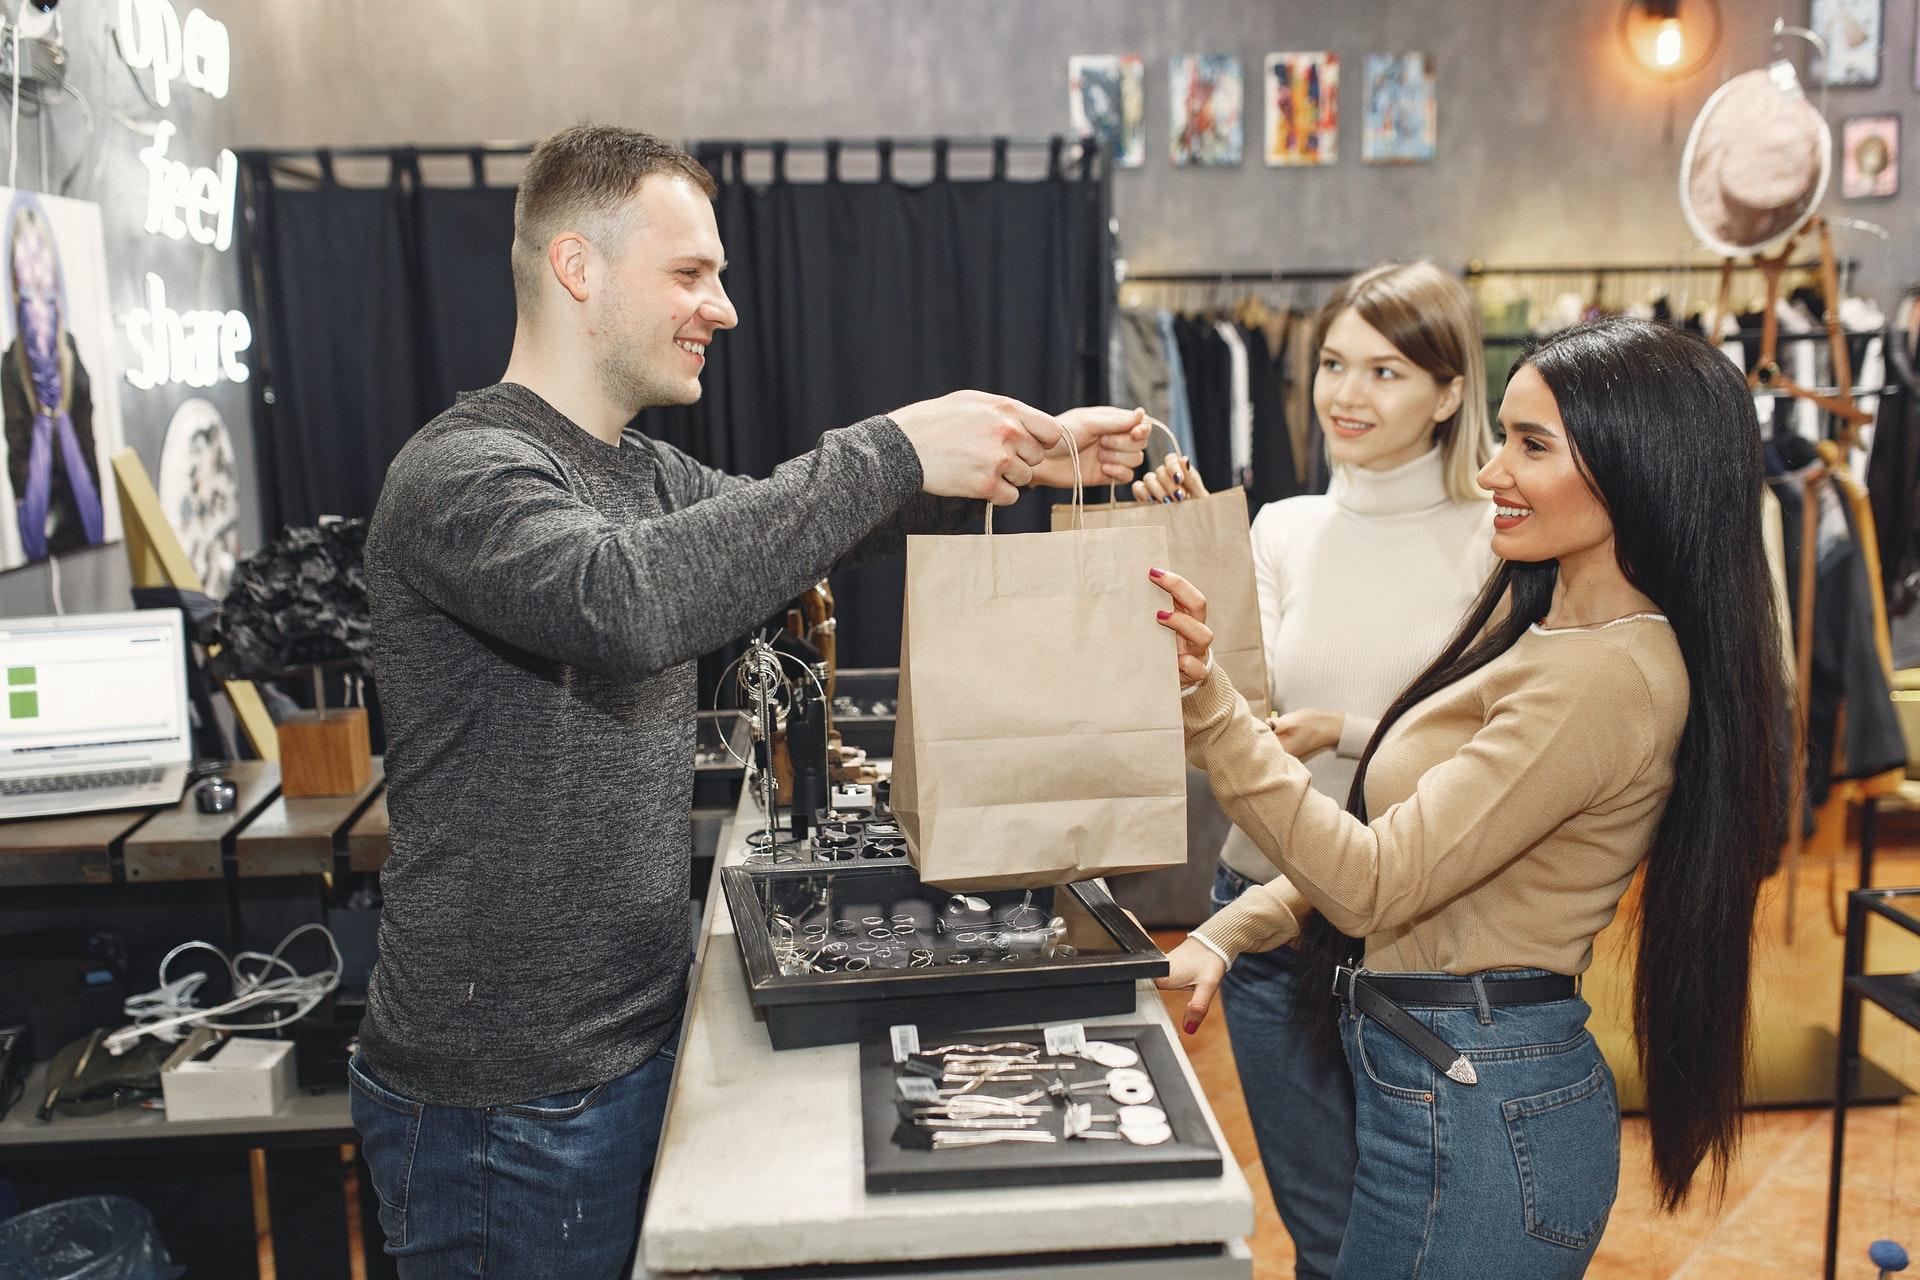 man handing shopping woman a bag at checkout